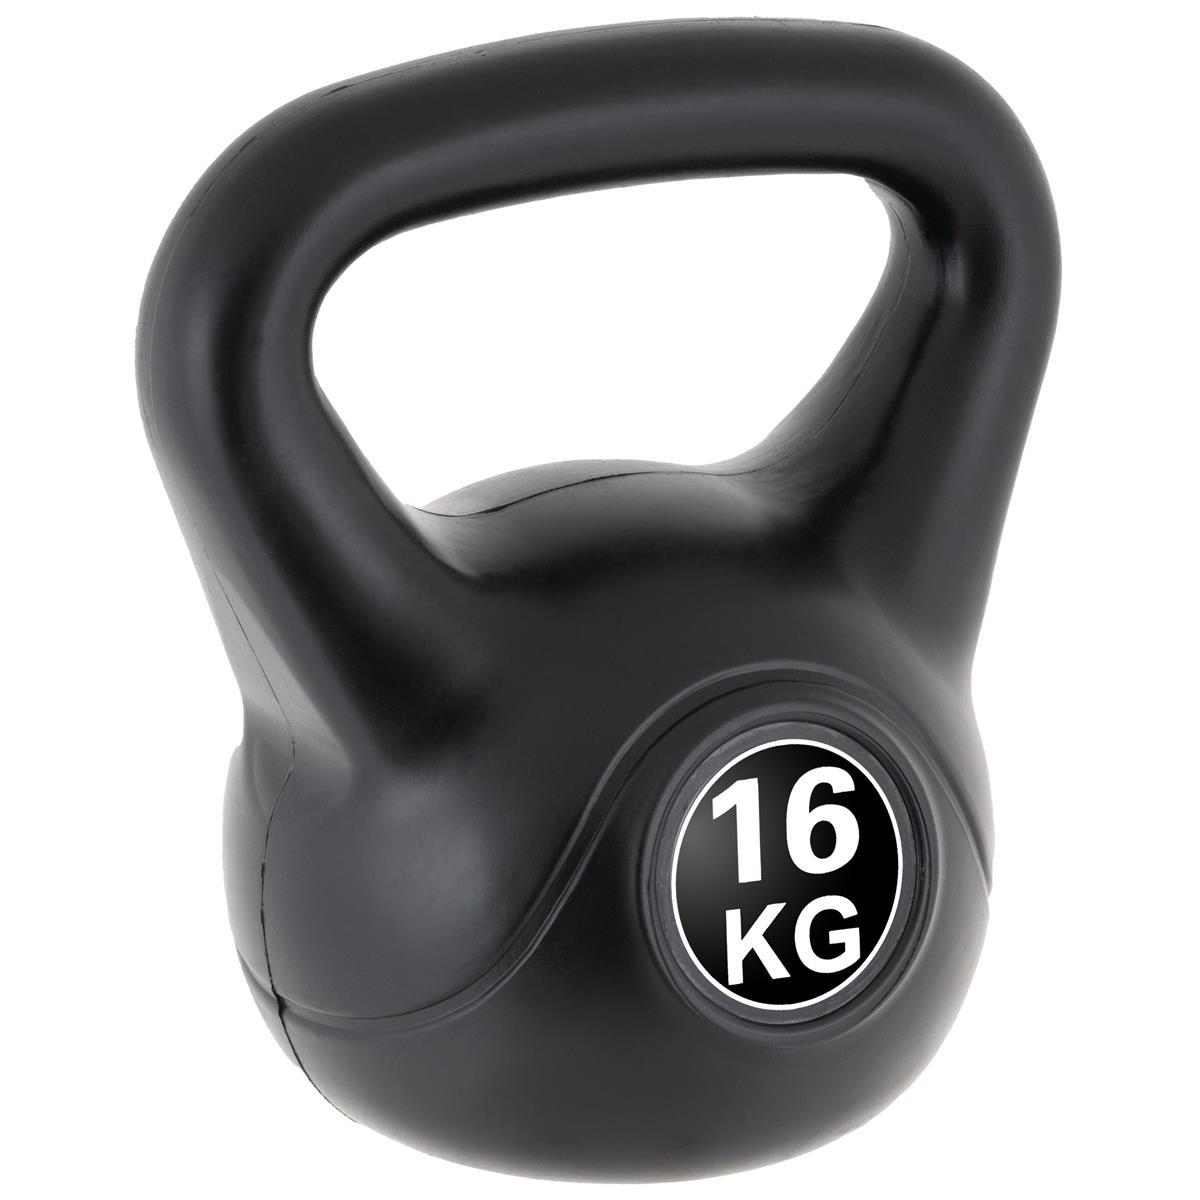 MAXXIVA Kettlebell Kugelhantel 16kg schwarz Krafttraining Fitness Rundhantel